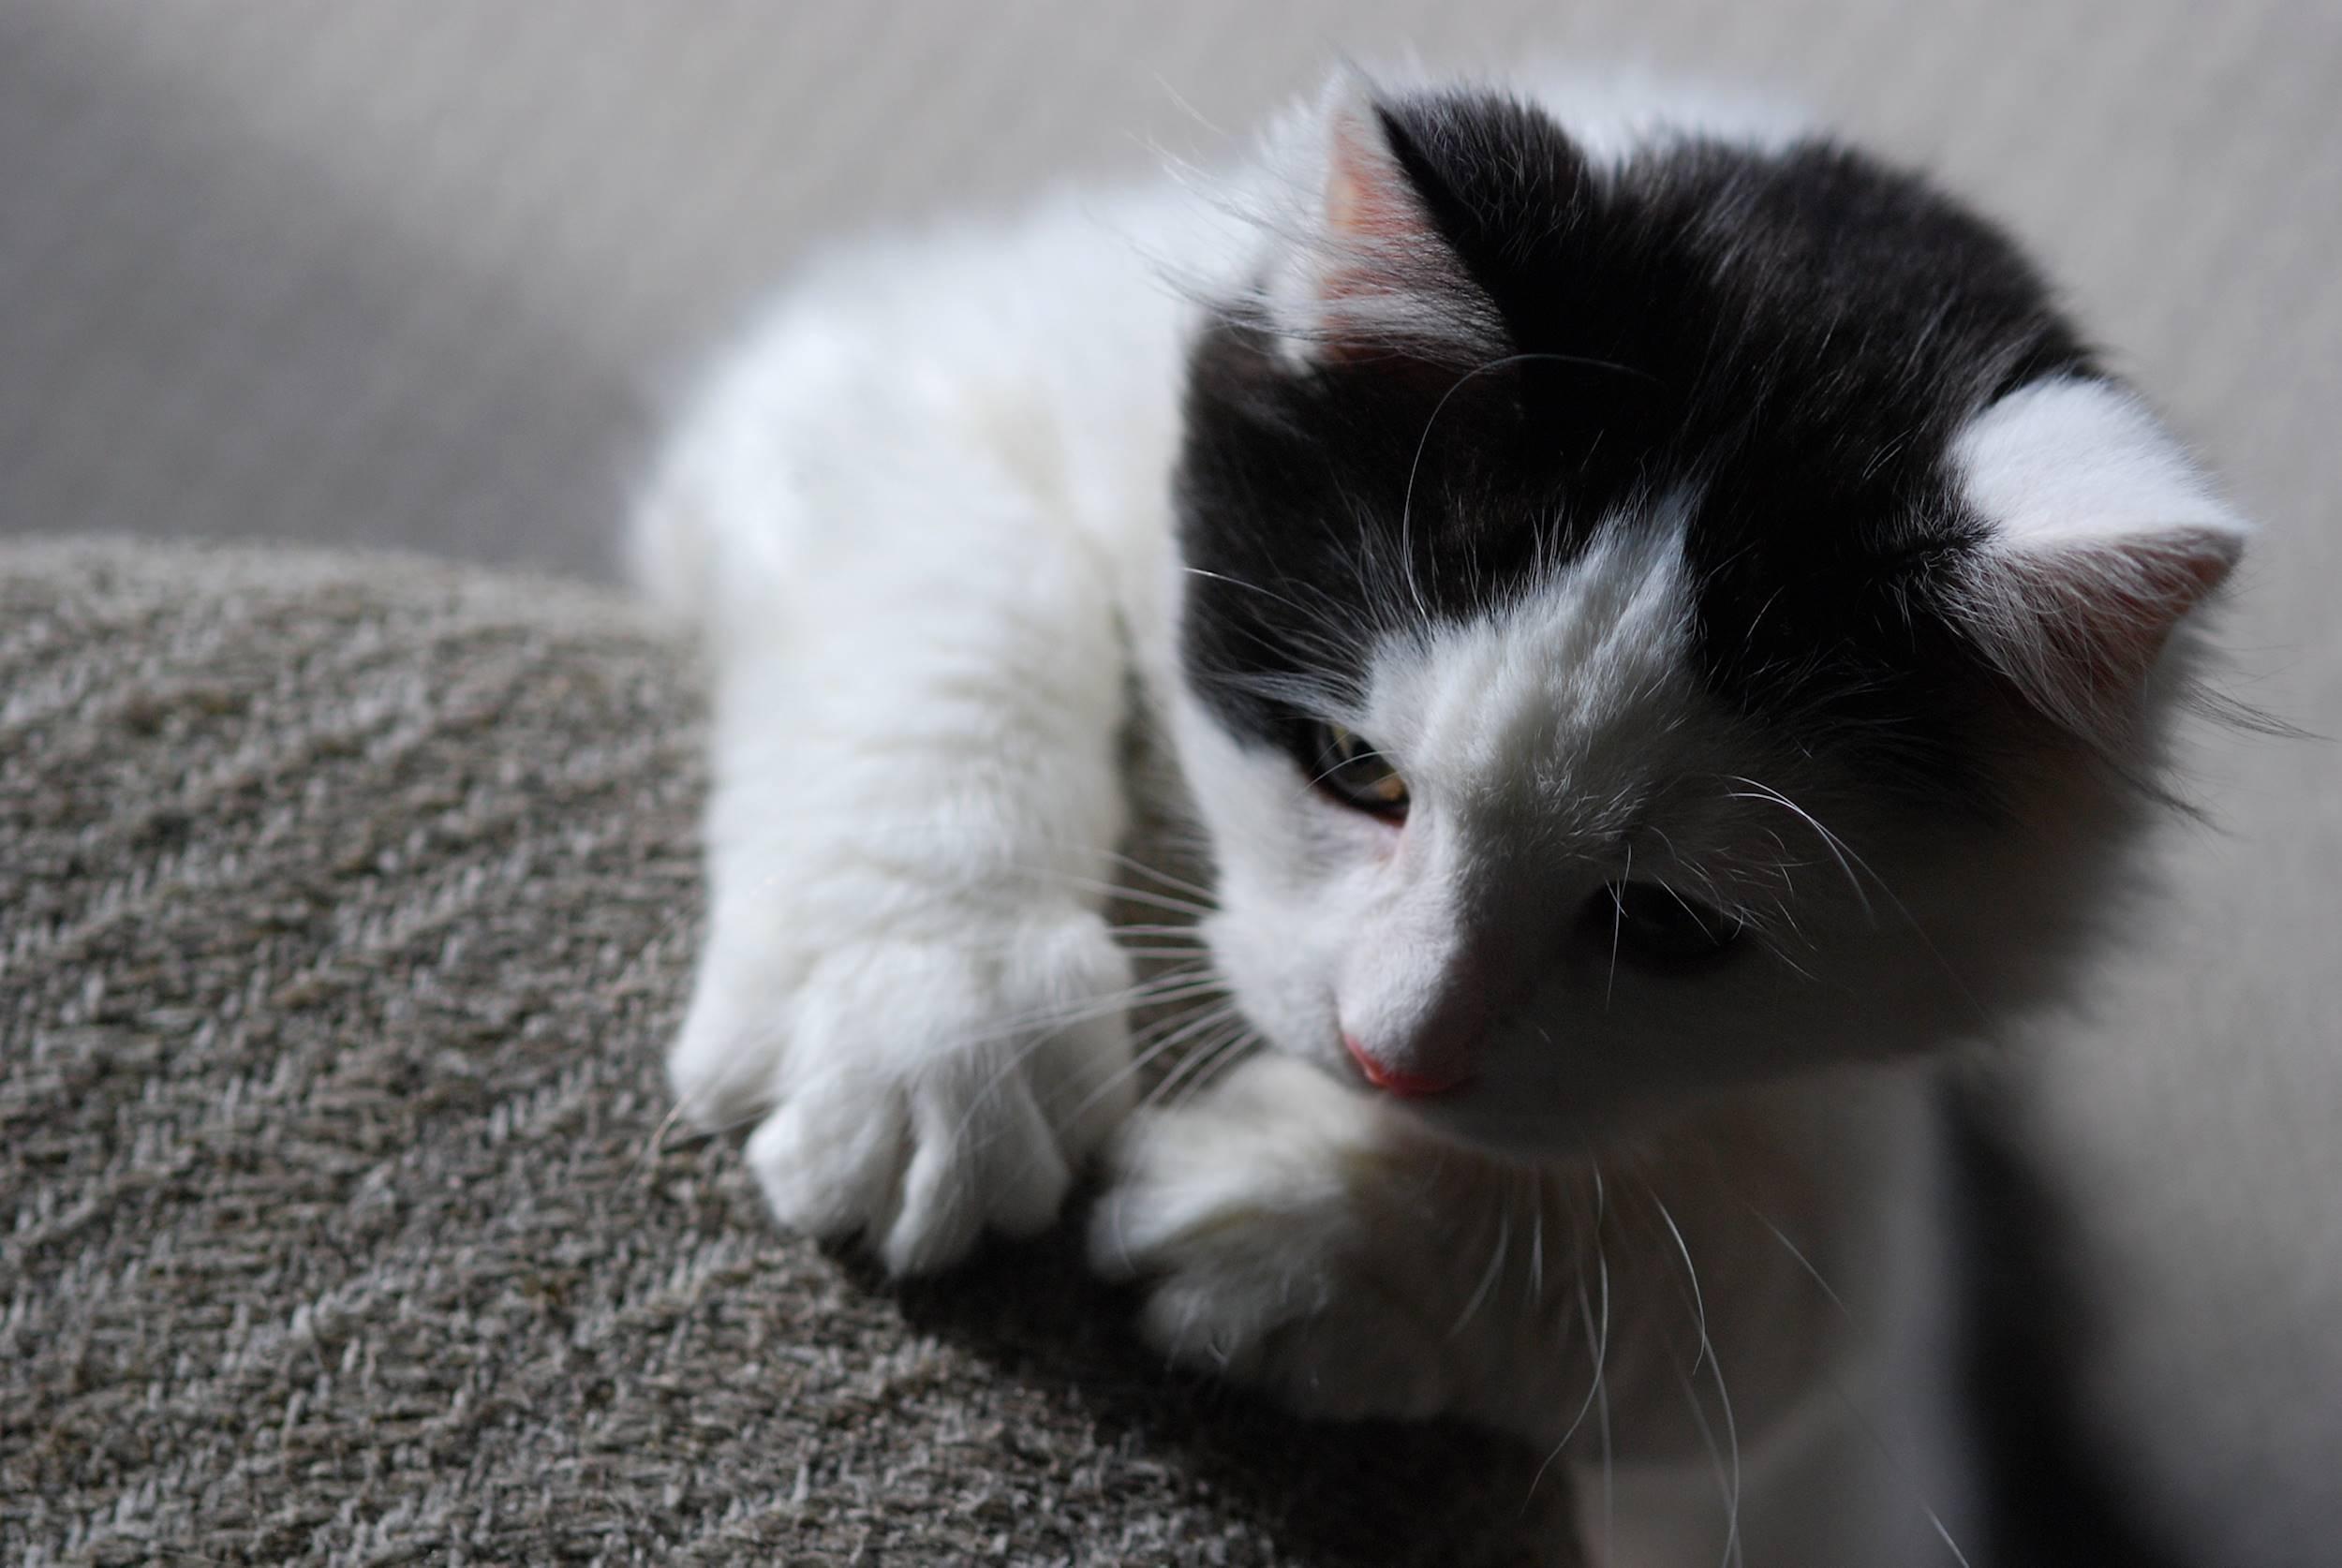 kitten playing ready to pounce